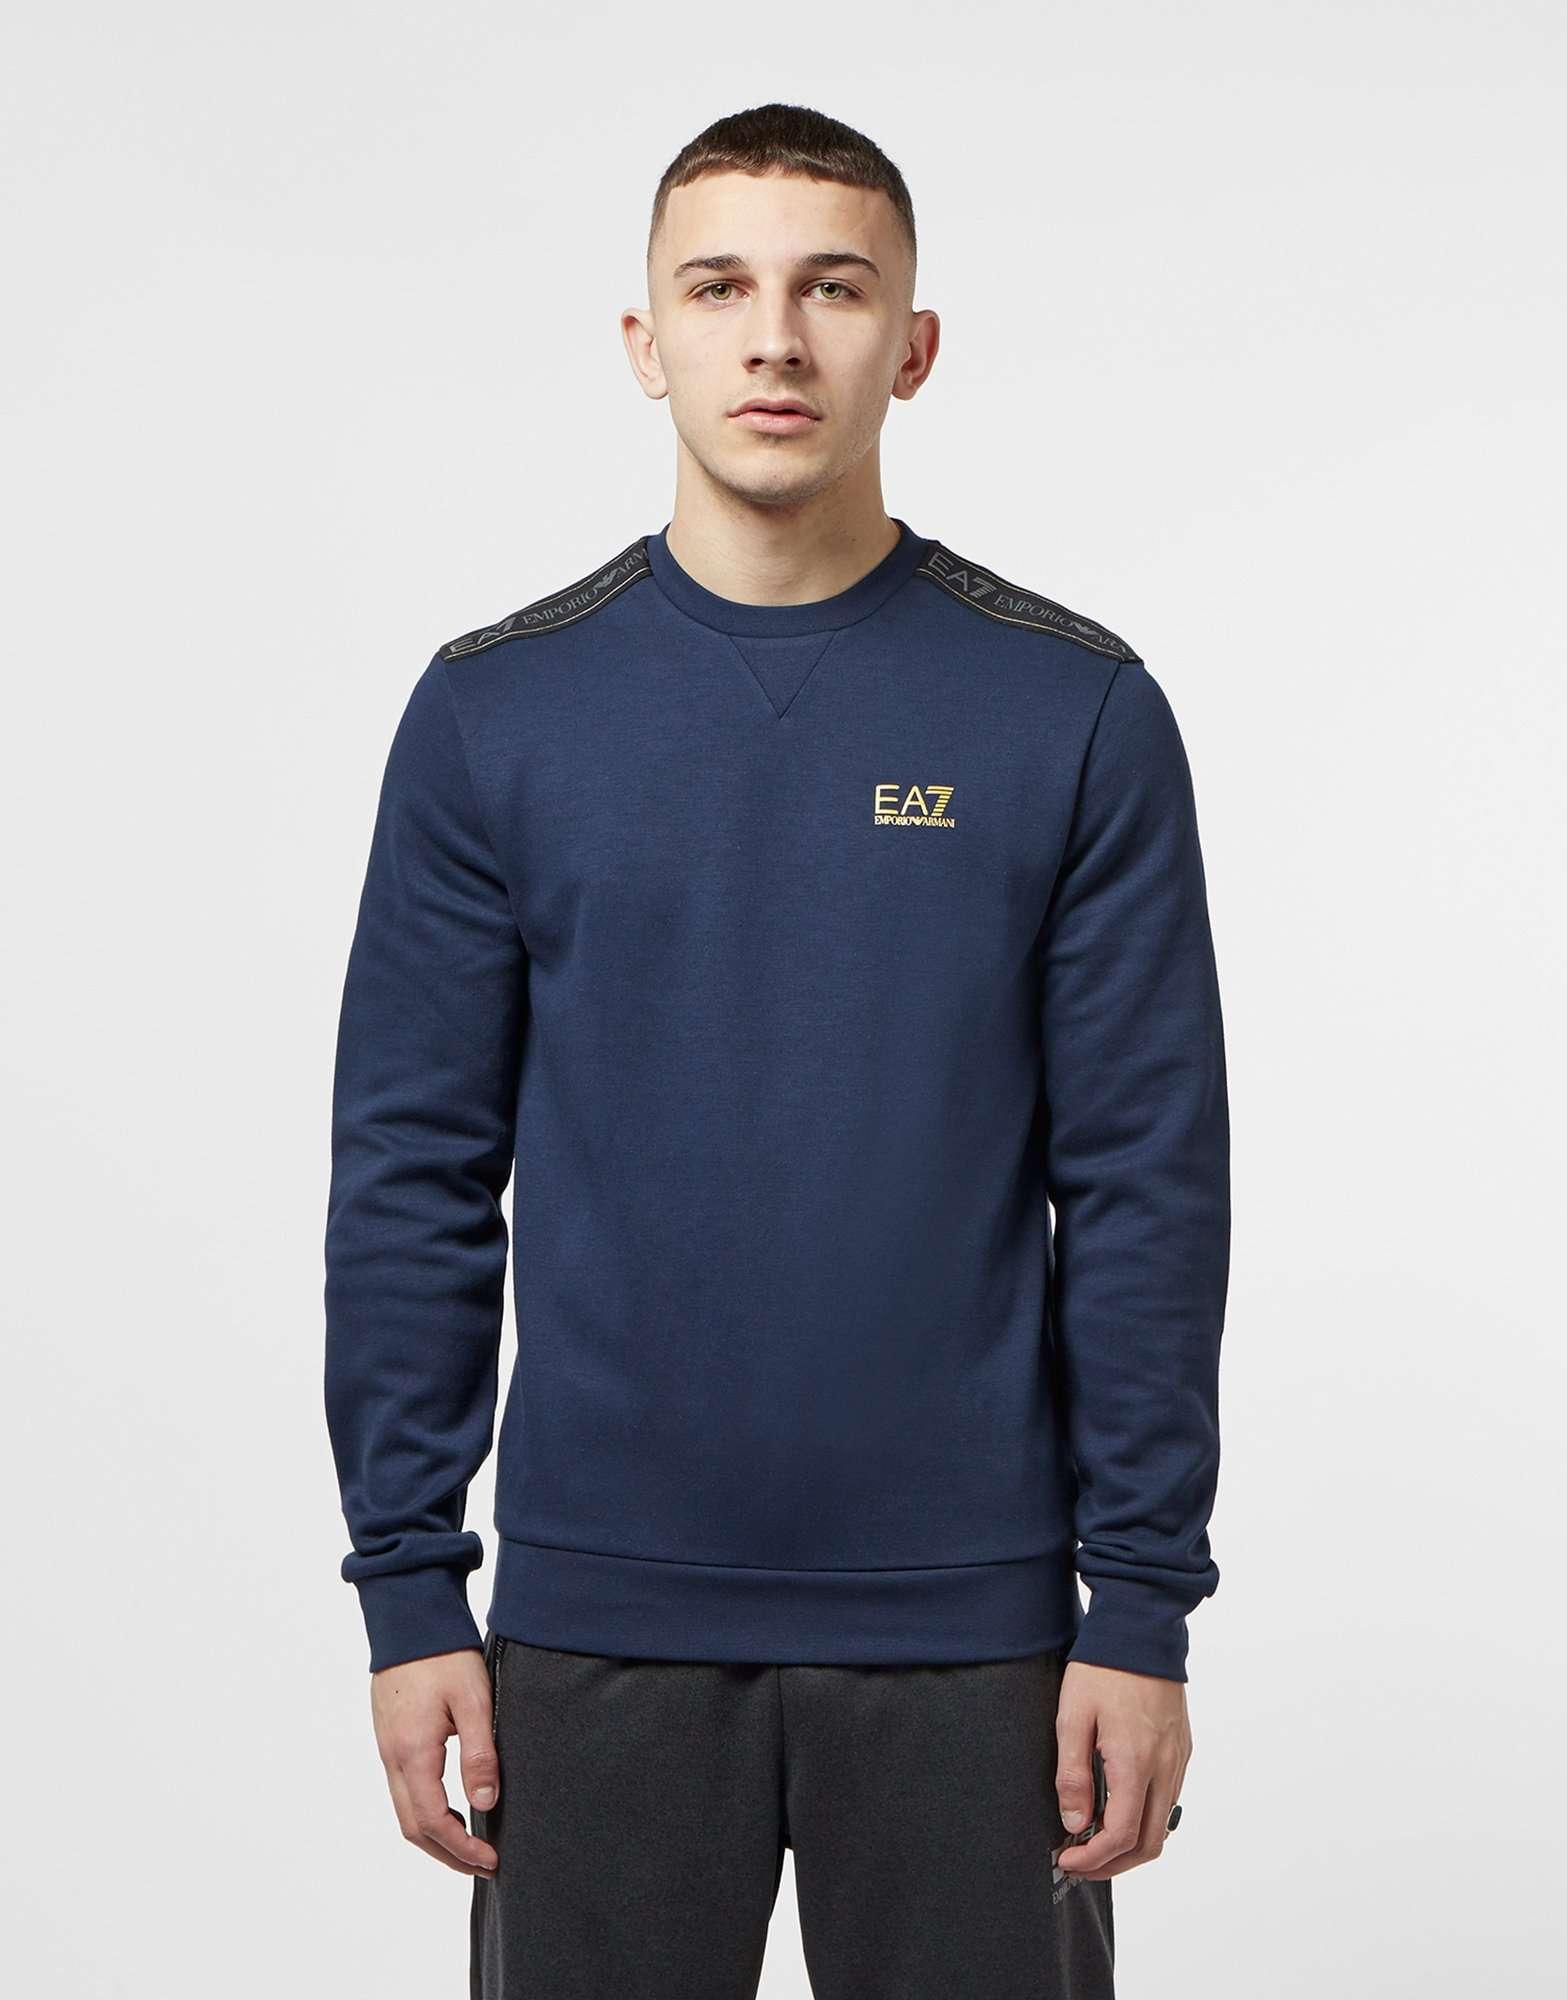 Emporio Armani EA7 Tape Crew Sweatshirt